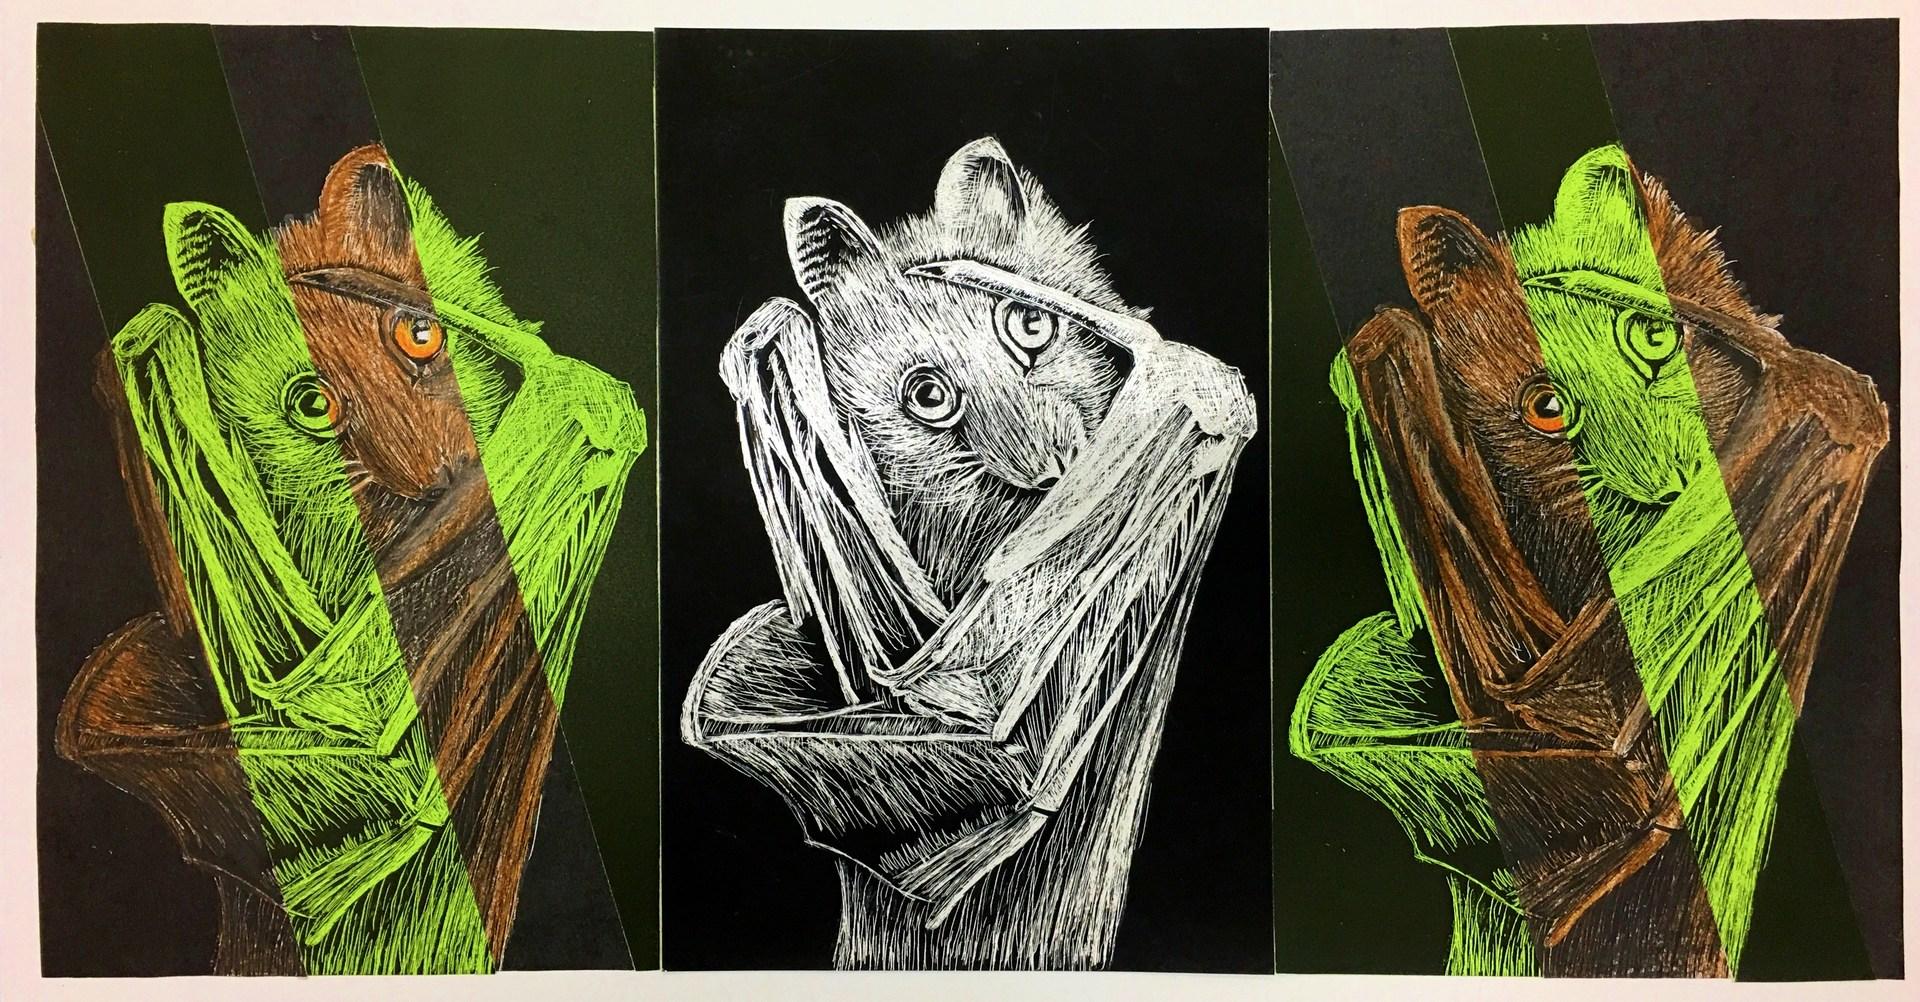 drawing of a bat